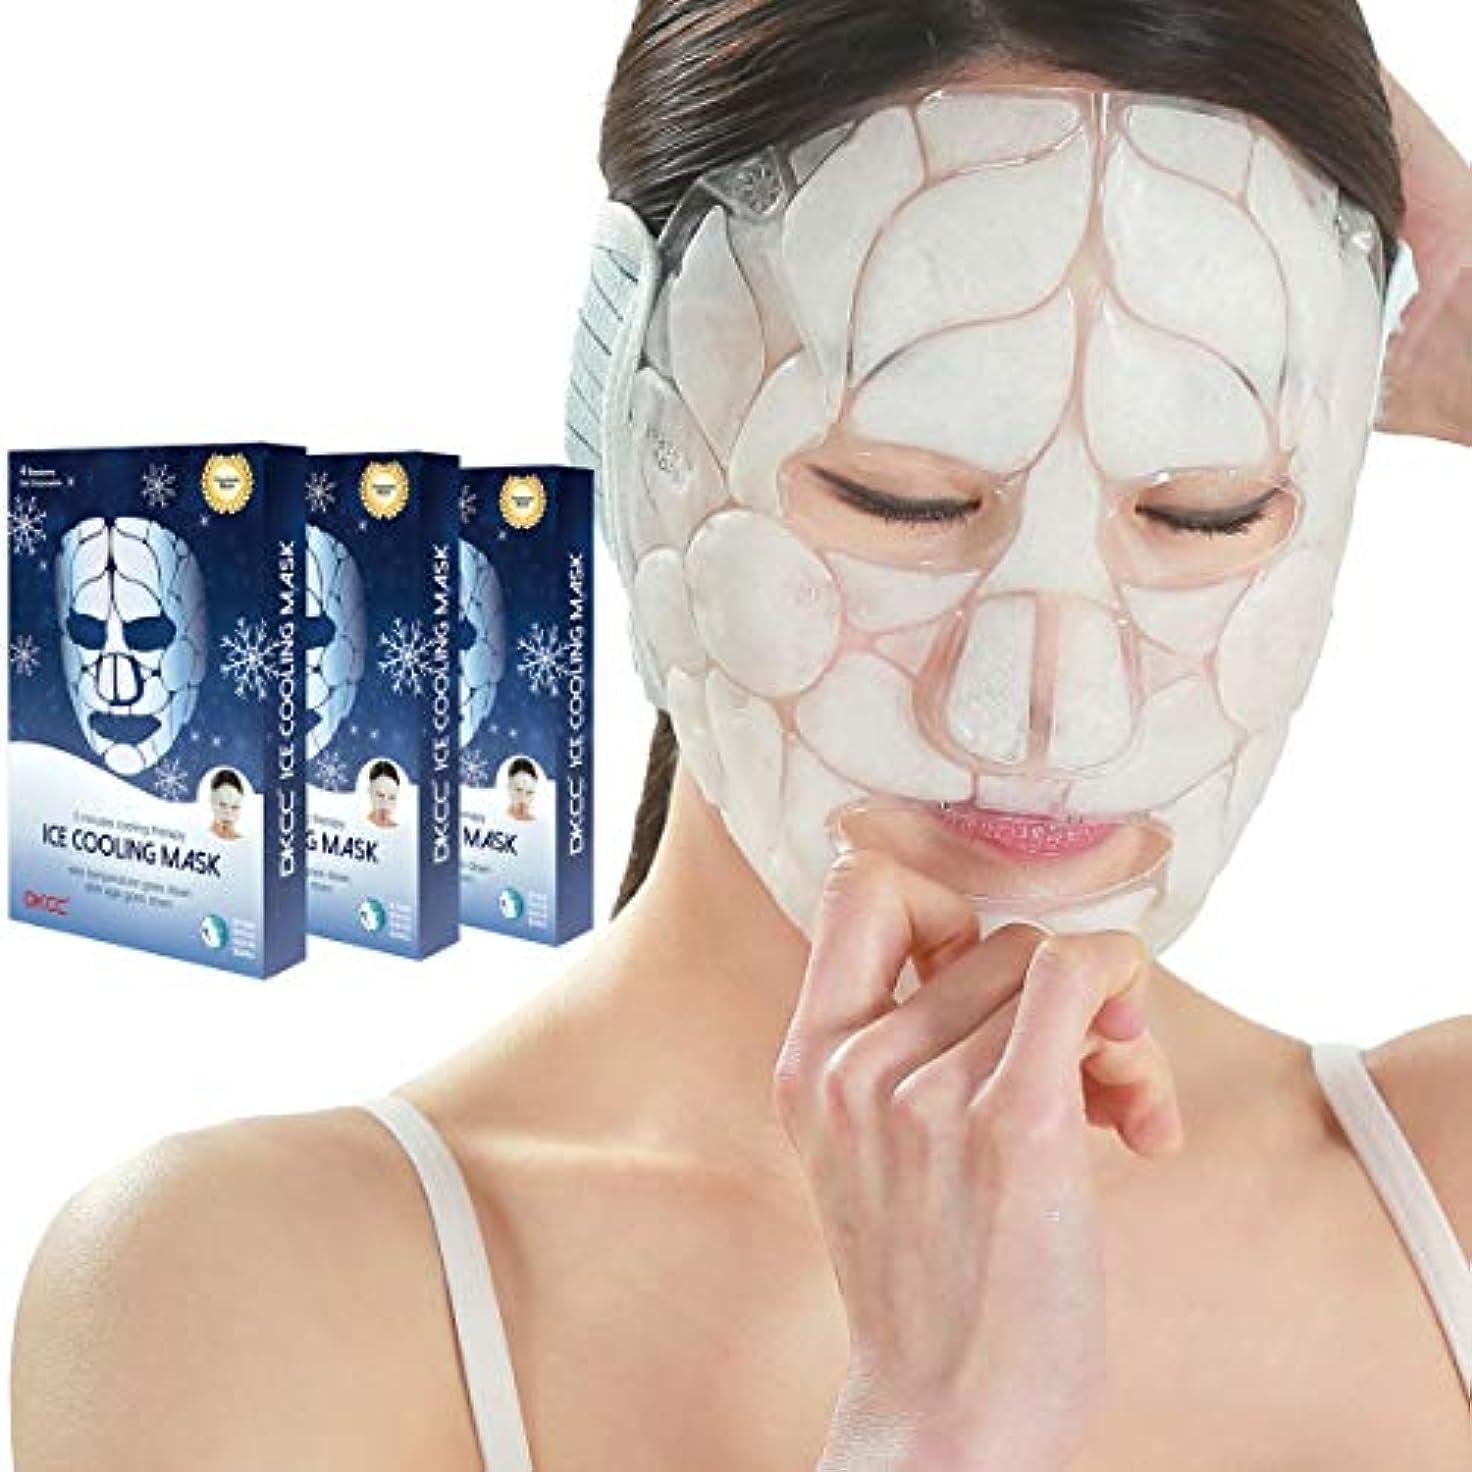 DKCC アイスクーリングマスク